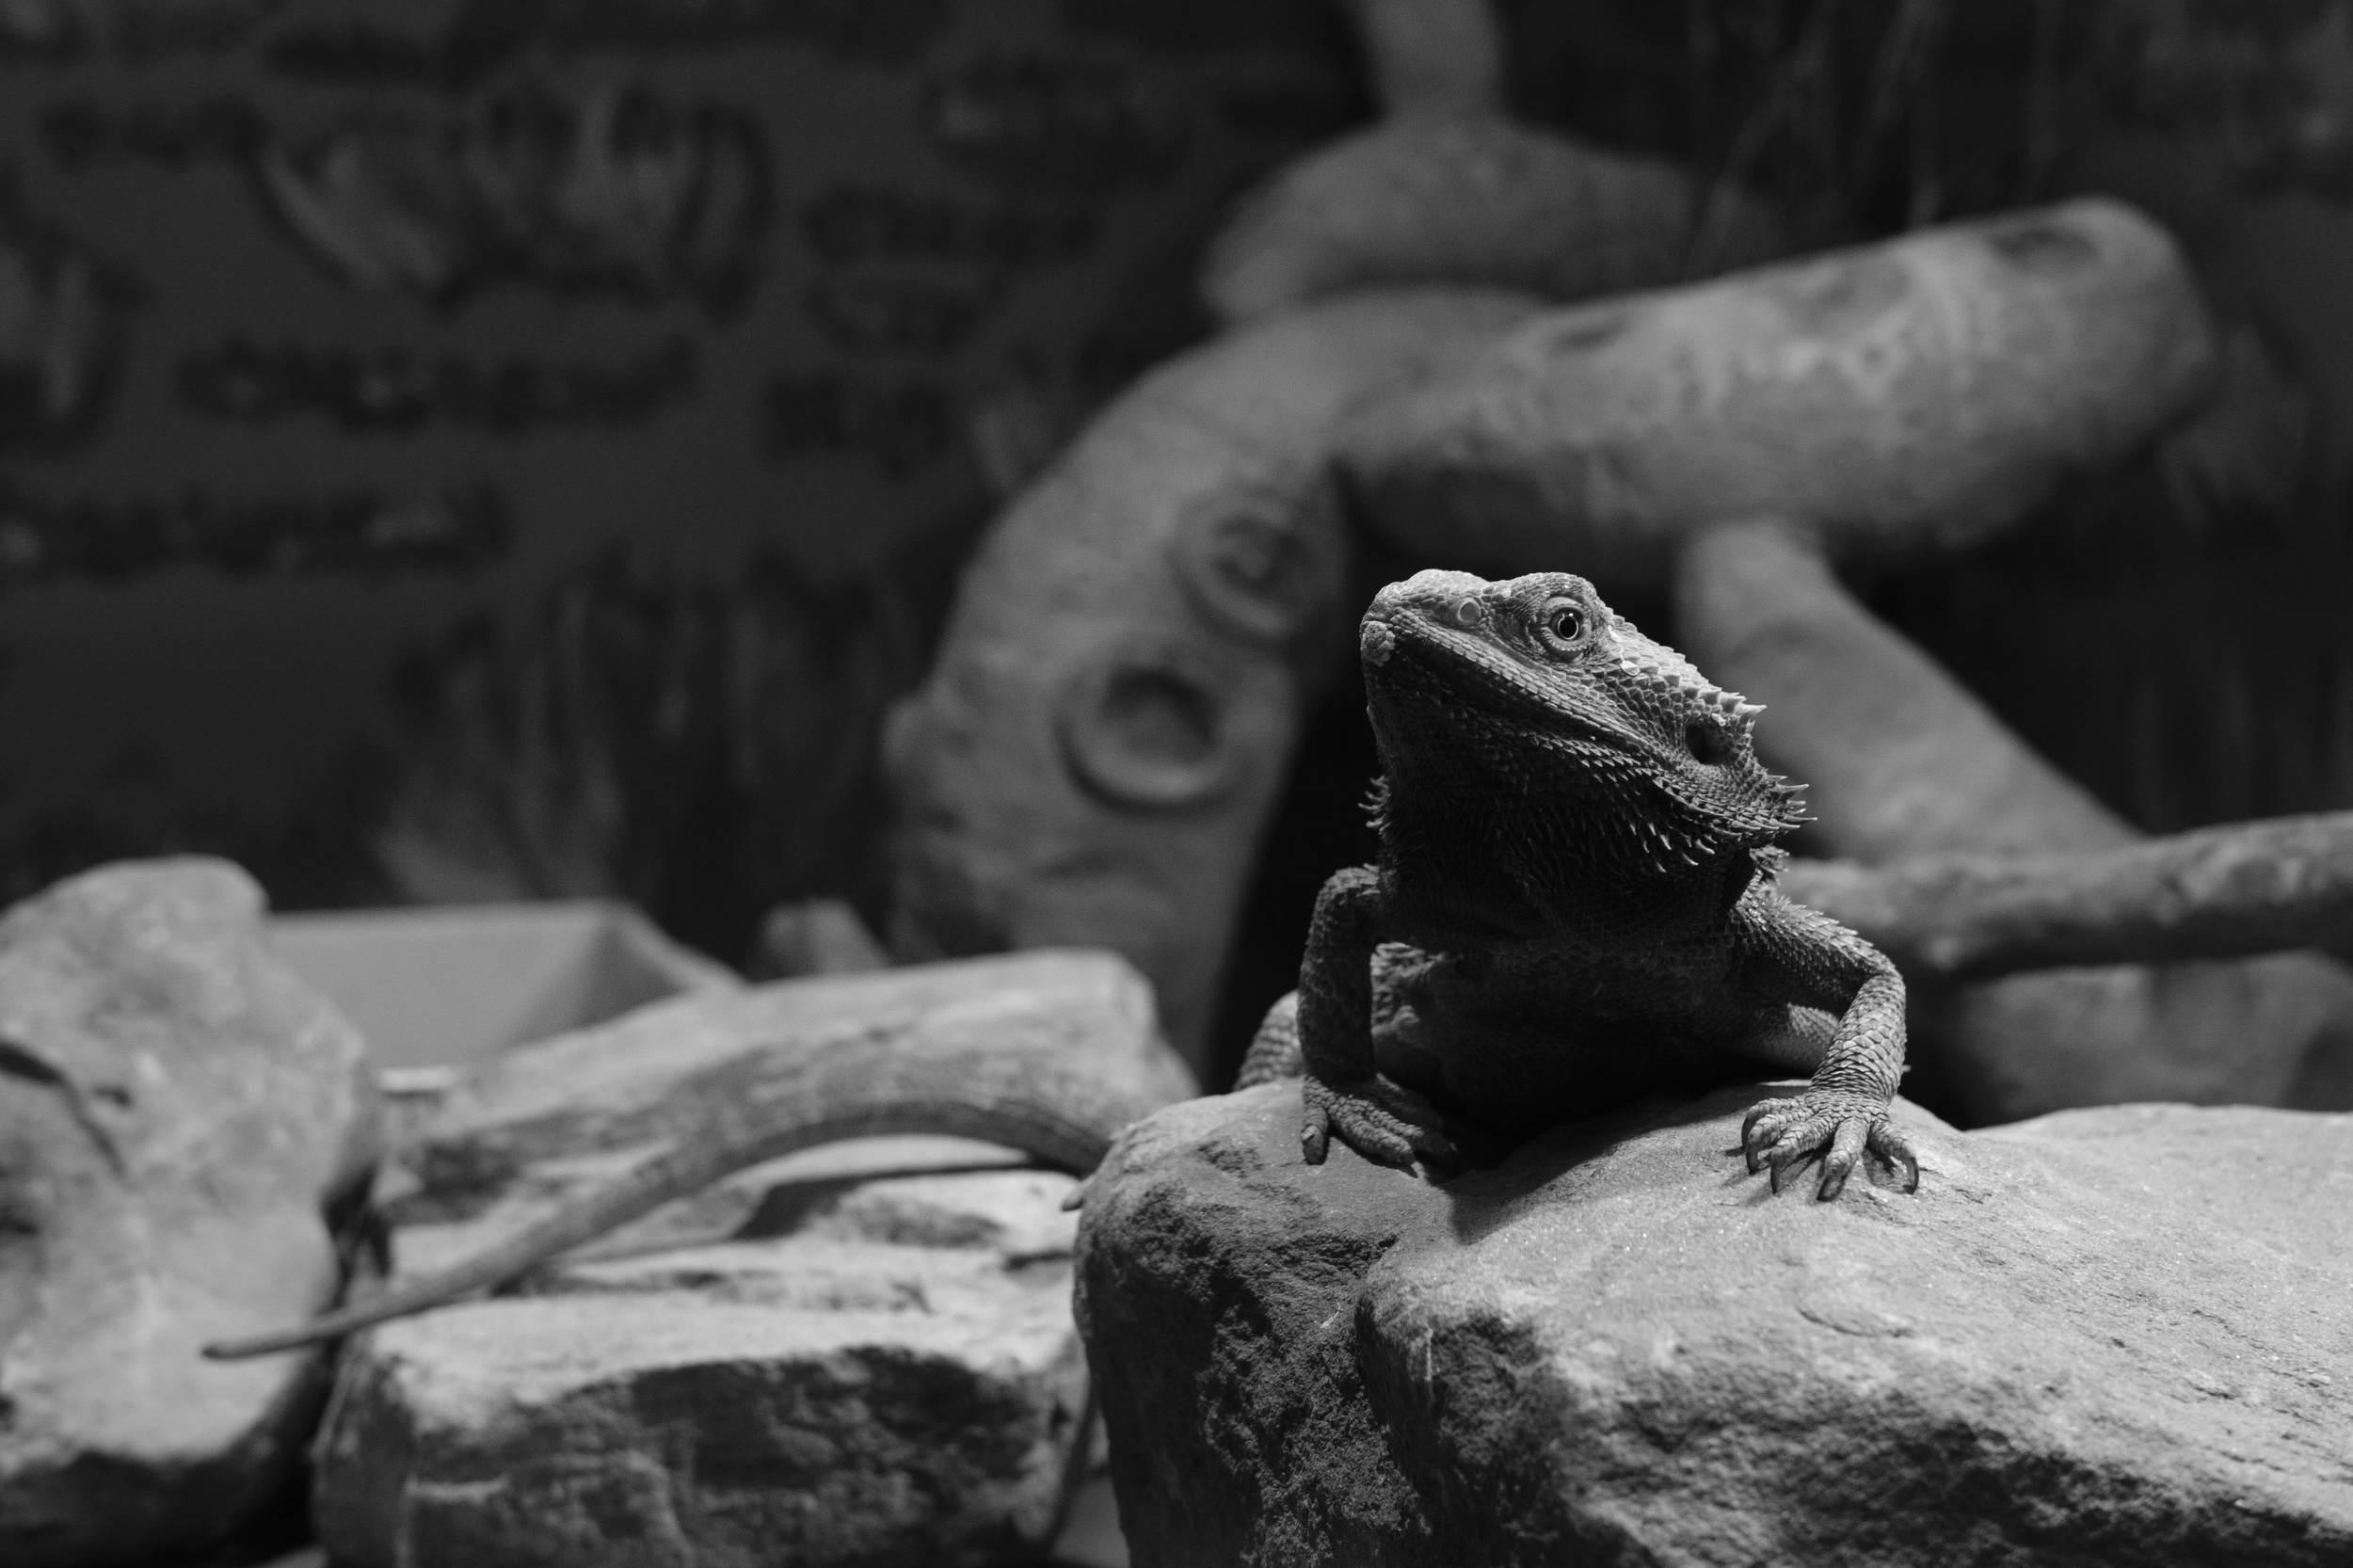 Black & White Lizard at Eshottheugh Animal Park, Northumberland